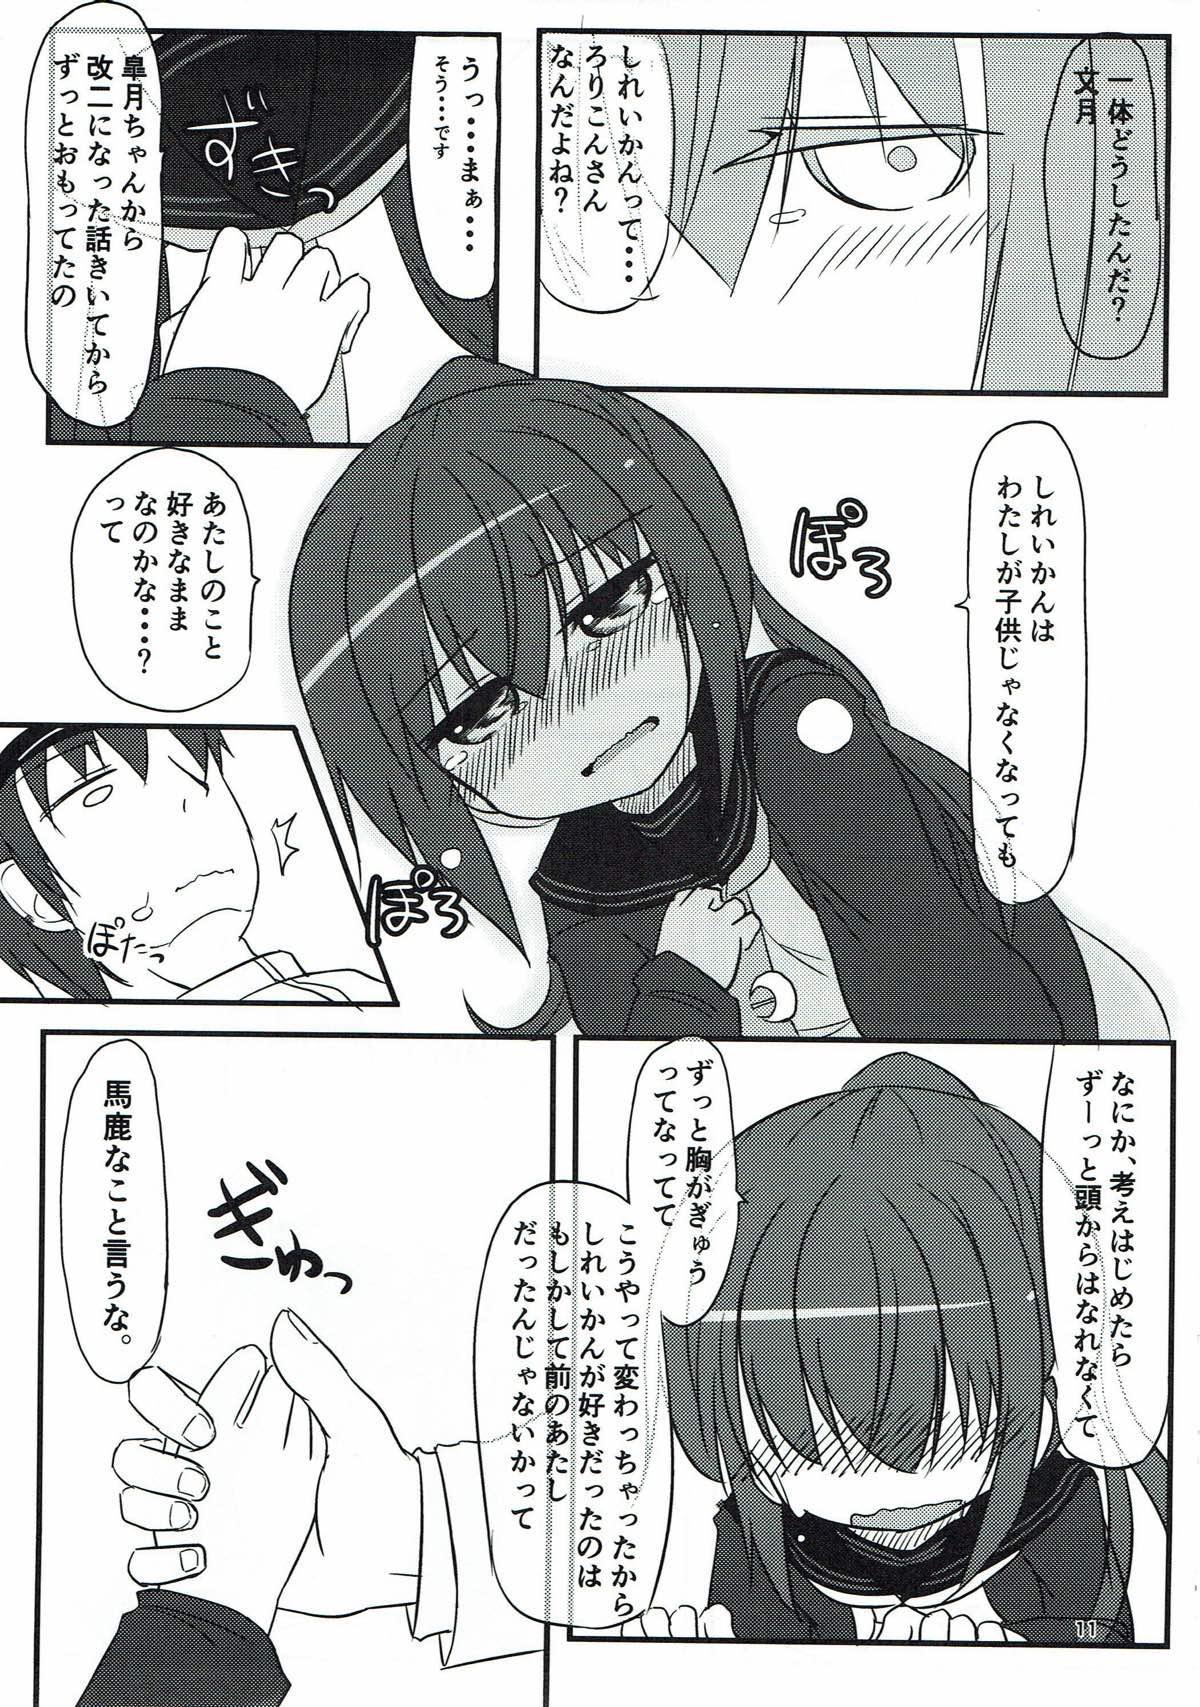 Fumizuki datte Chanto Dekirun dakara! 9